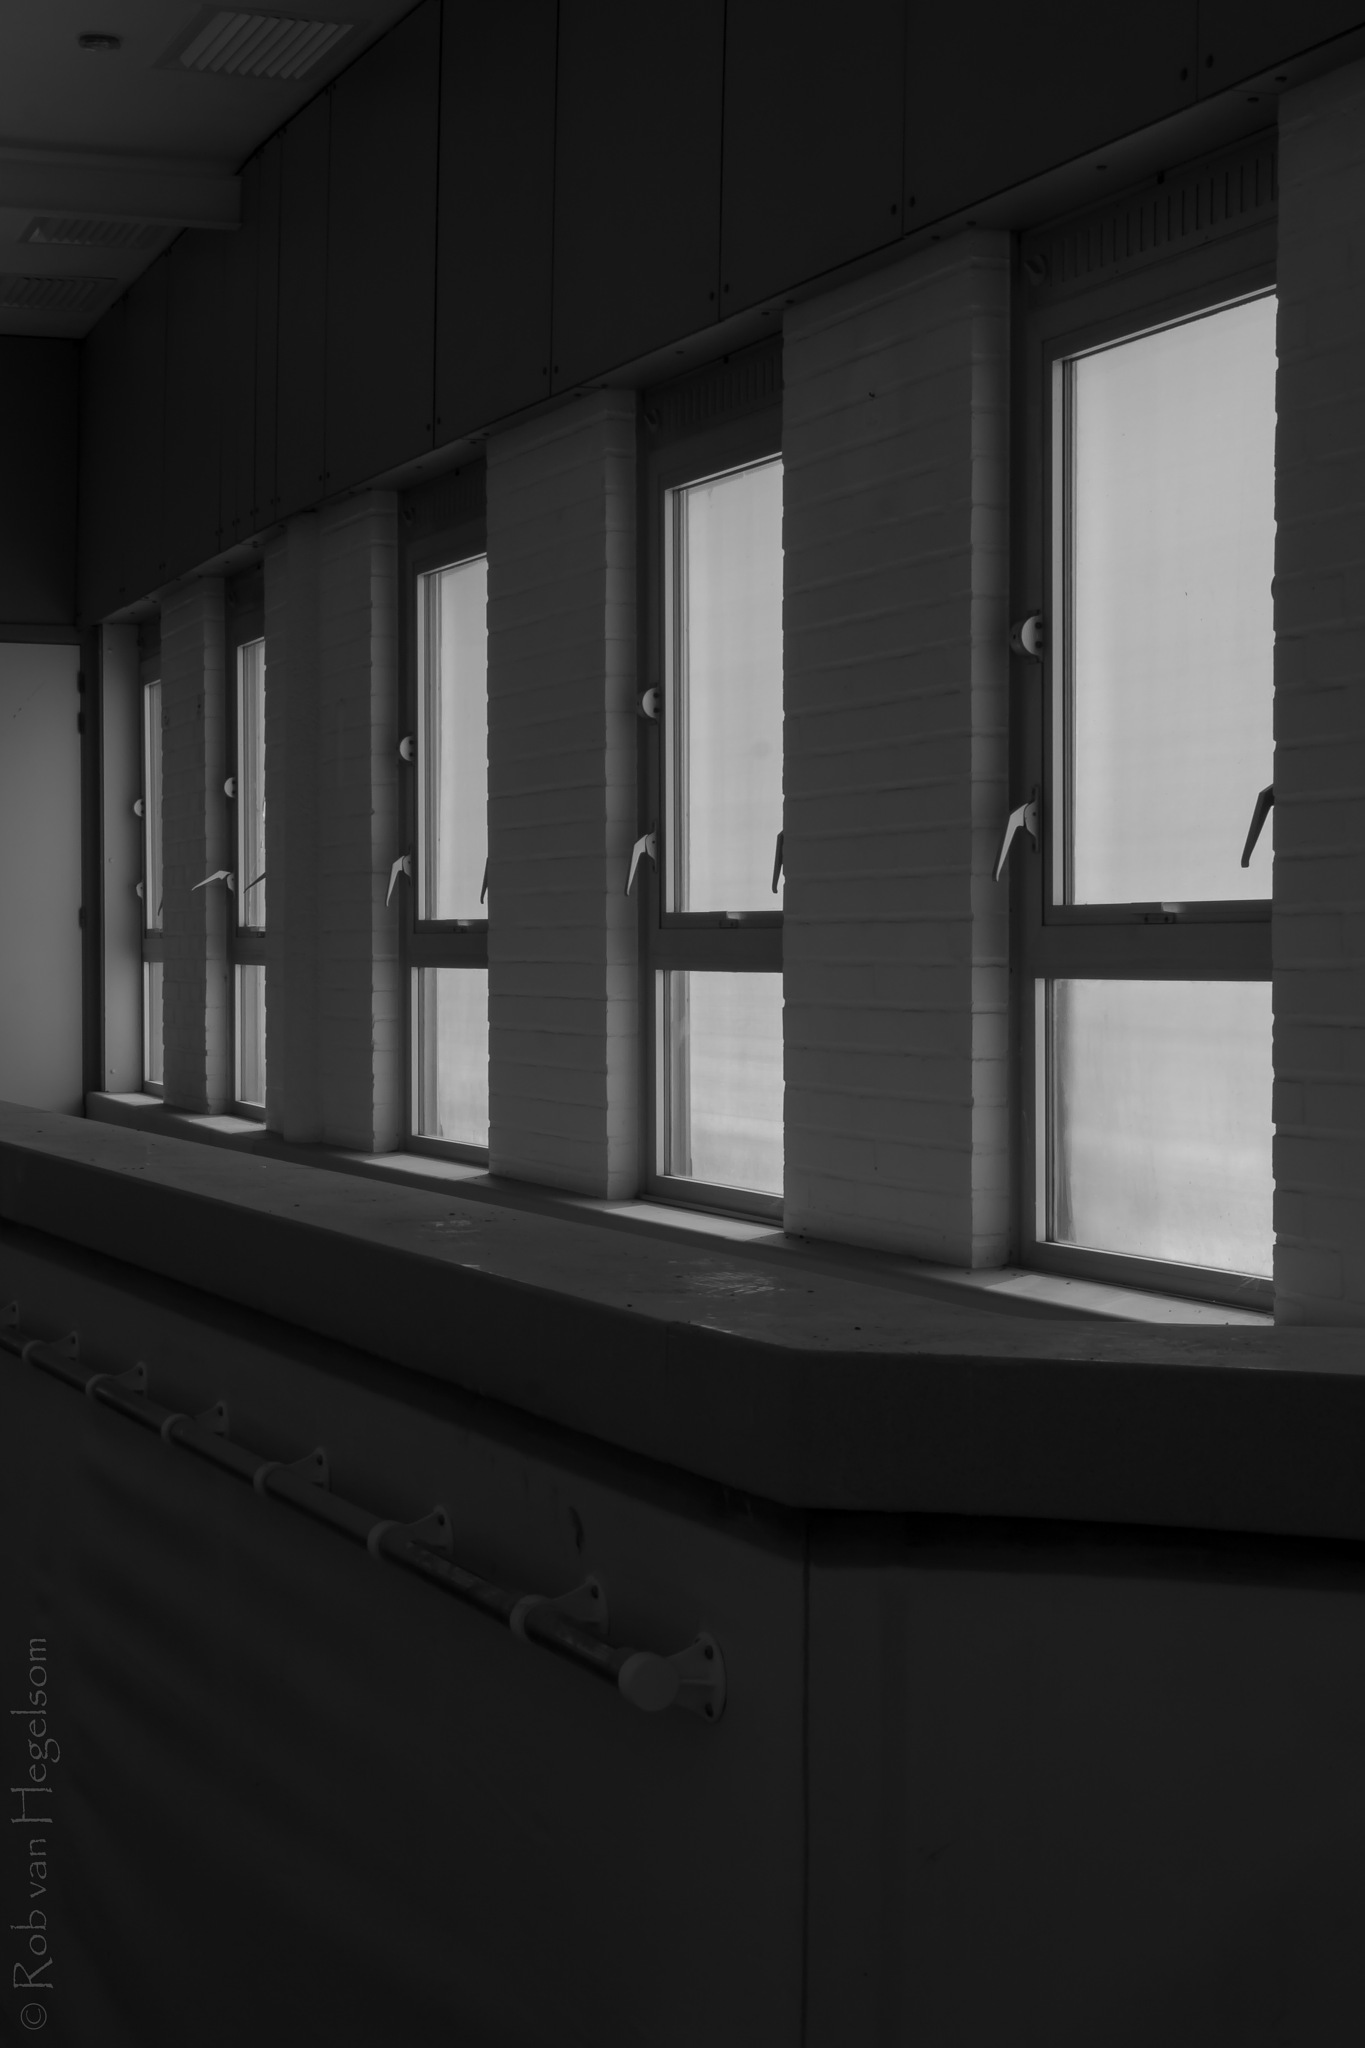 5 Windows by rvanhegelsom